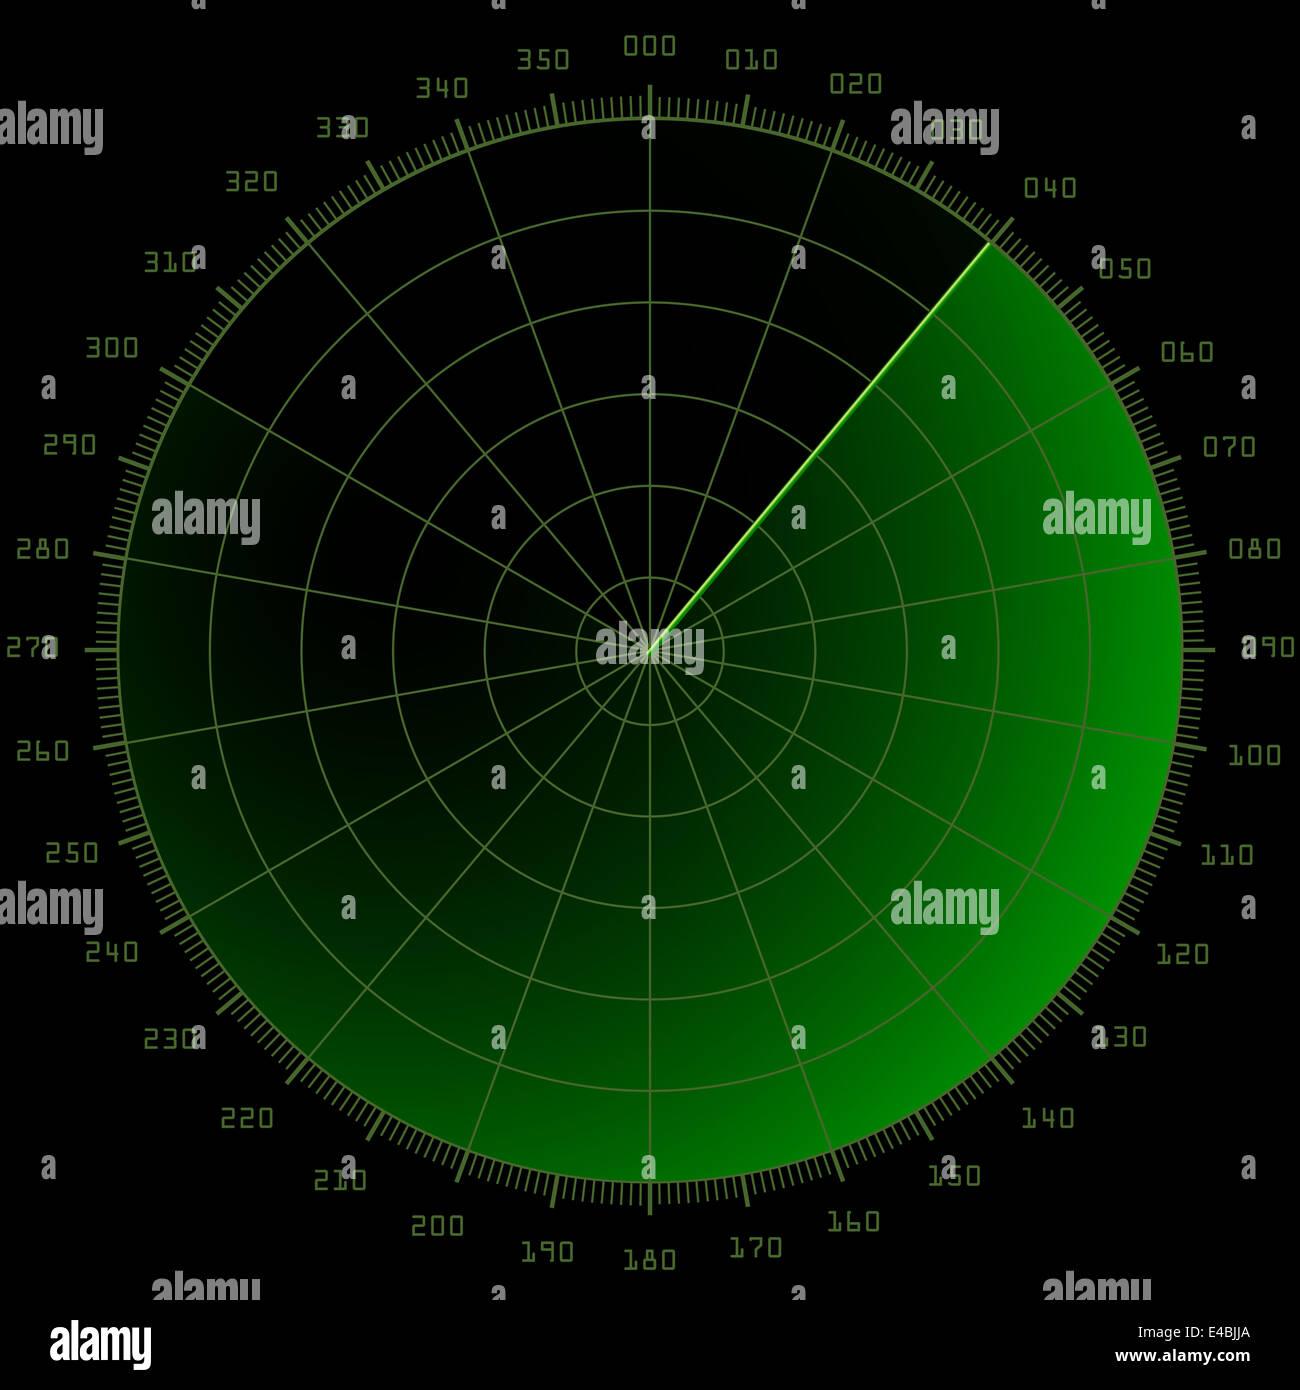 radar screen - Stock Image